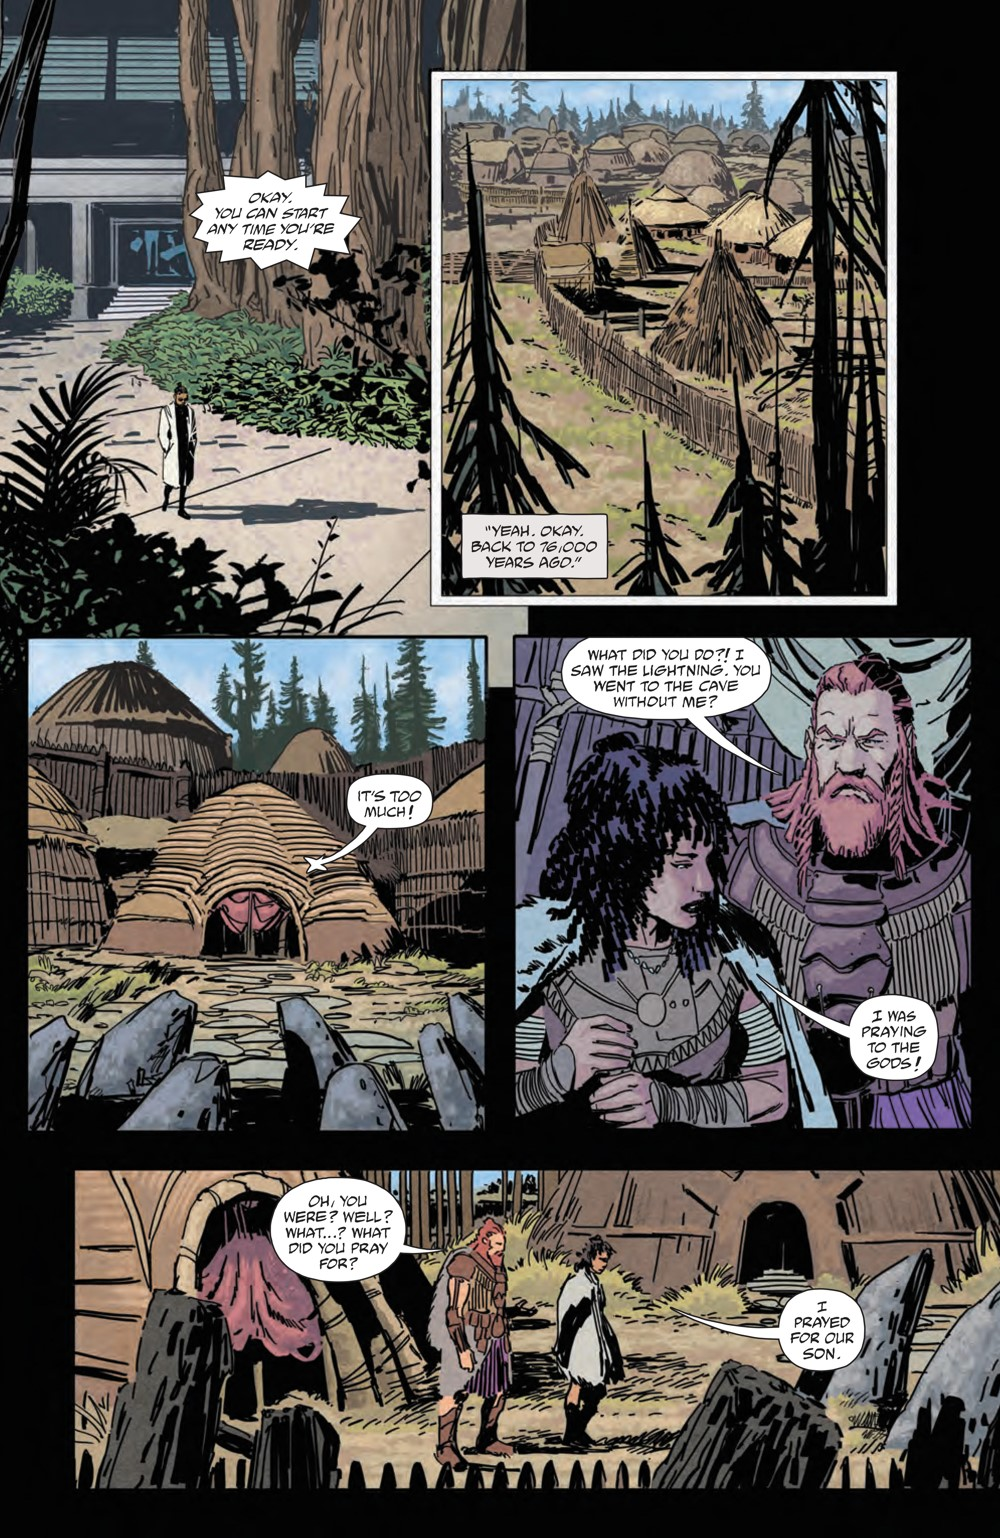 BRZRKR_004_PRESS_4 ComicList Previews: BRZRKR #4 (OF 12)